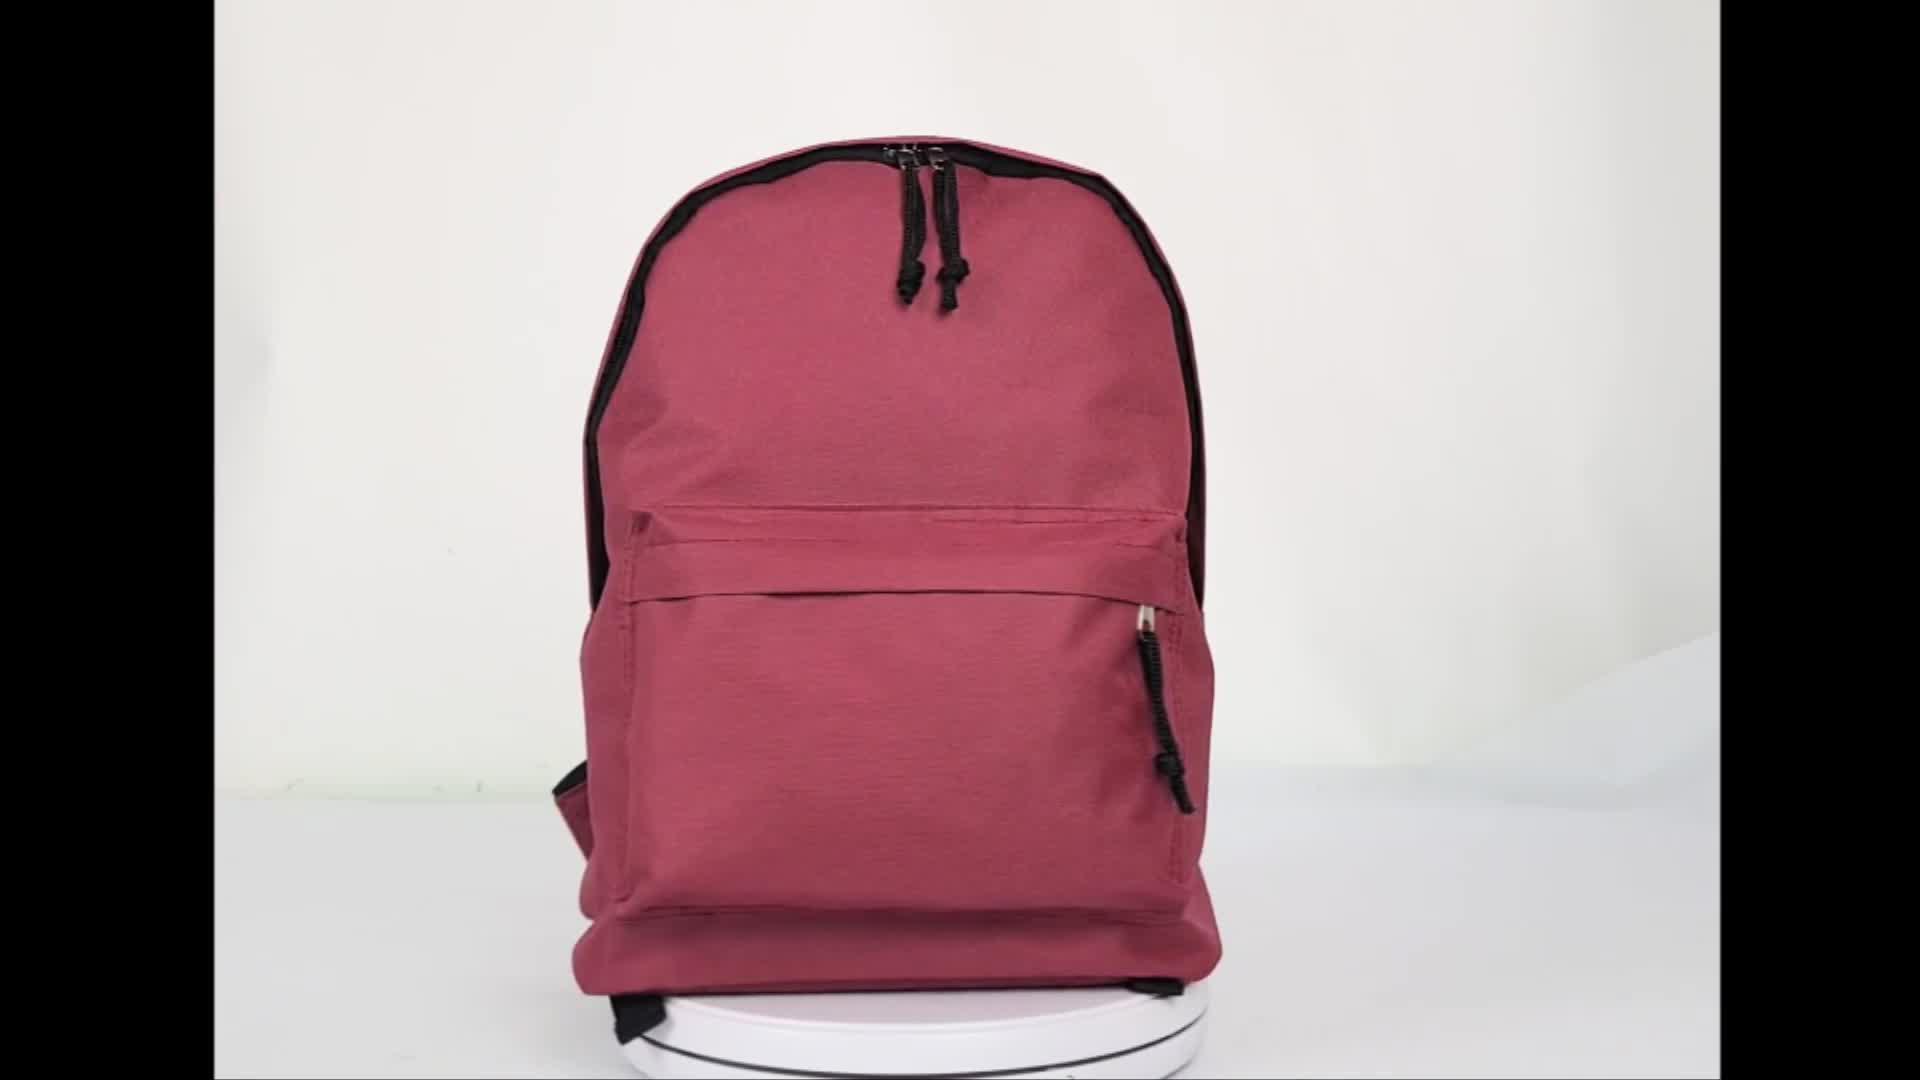 2020 Hot Selling fashion trend kids school bag Backpack hand bag